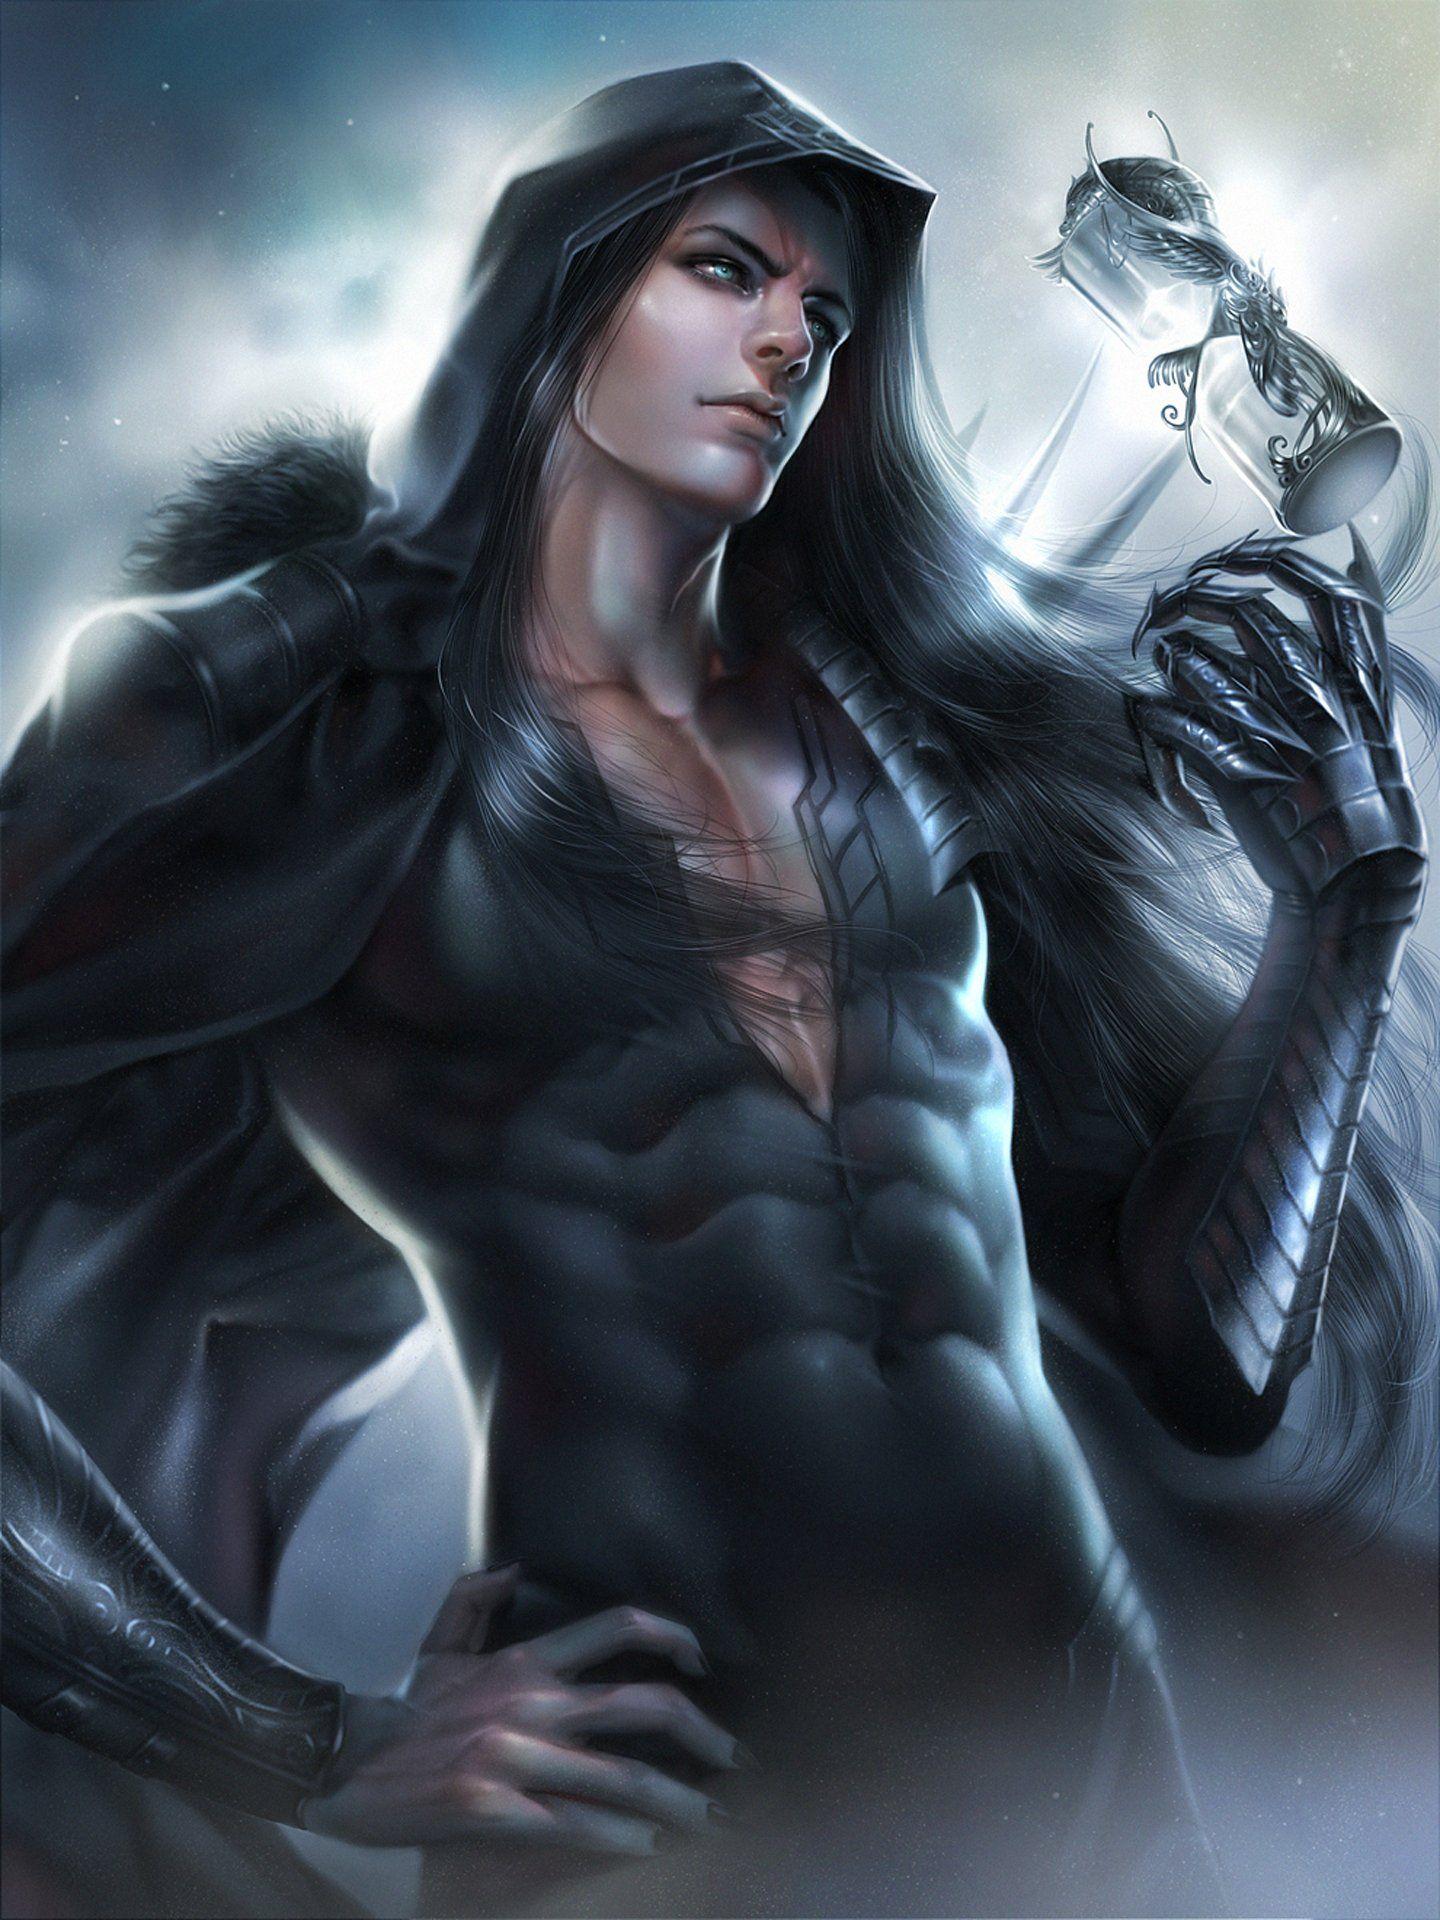 Original Fantasy Male Zeilyan Long Hair Blue Eyes Wallpaper 1440x1920 589500 Fantasy Art Men Fantasy Male Fantasy Art